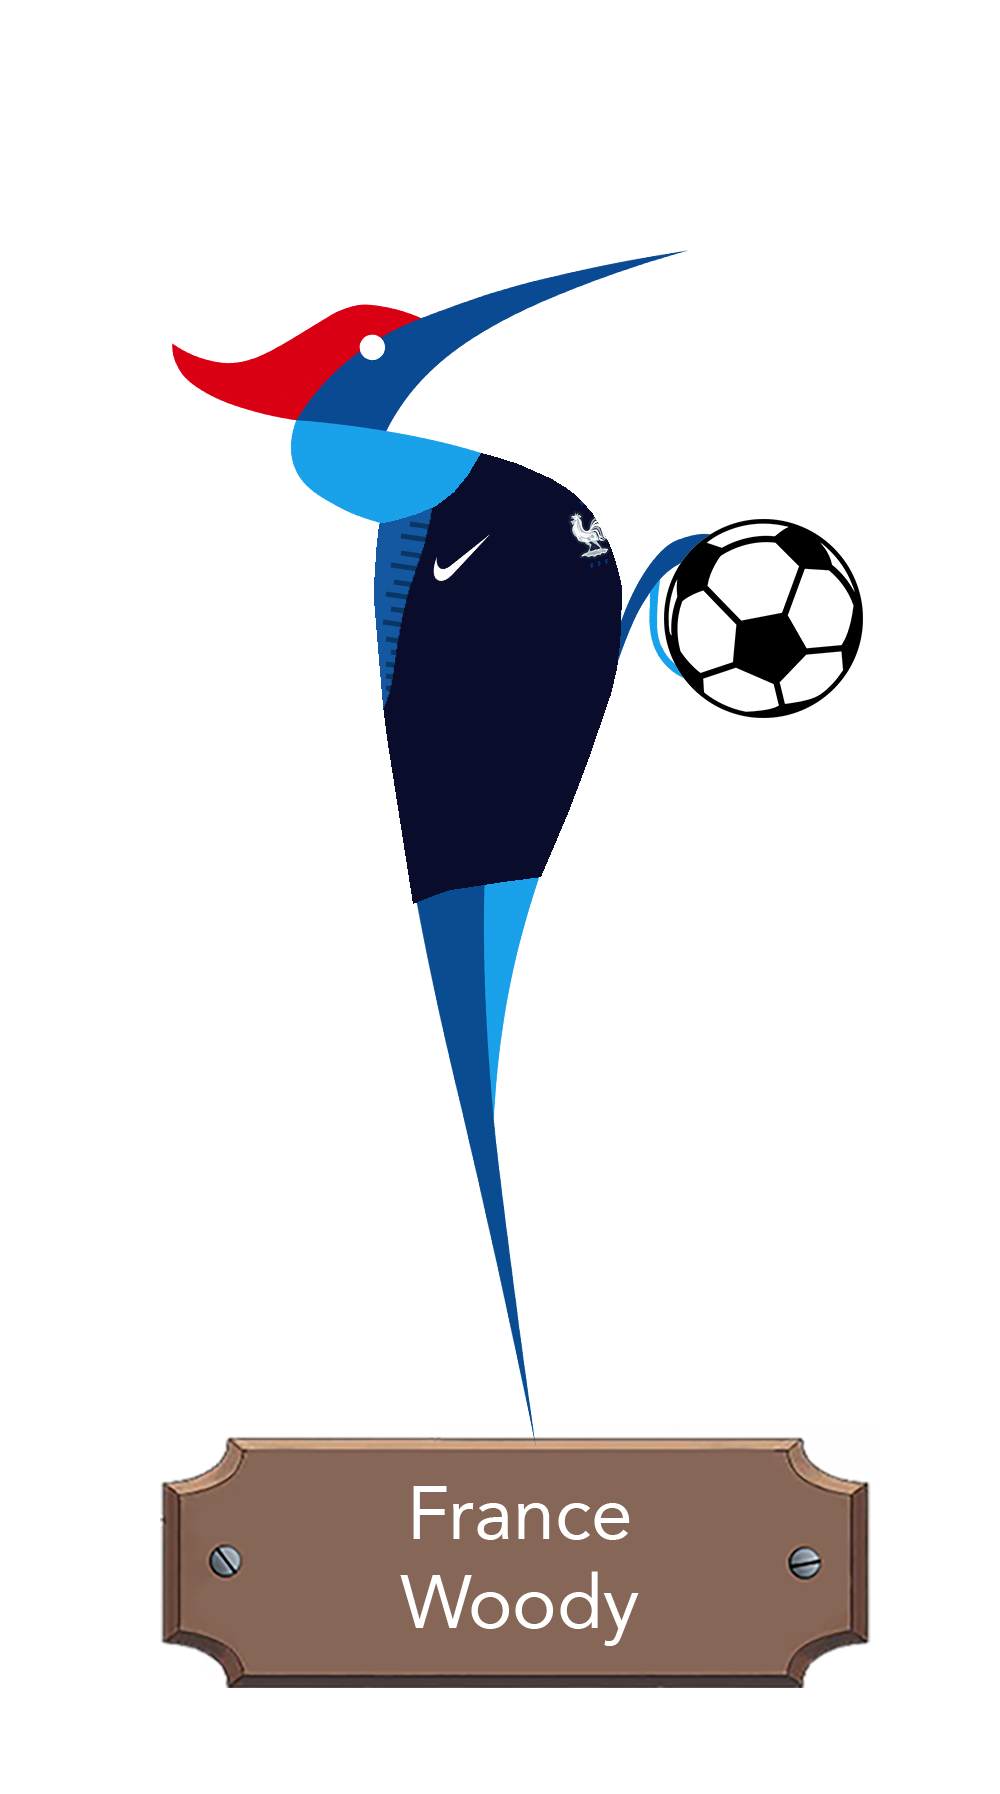 Pin by Strikedeck on Fun | Fun, Logos, Letters - Funny Nike Logos